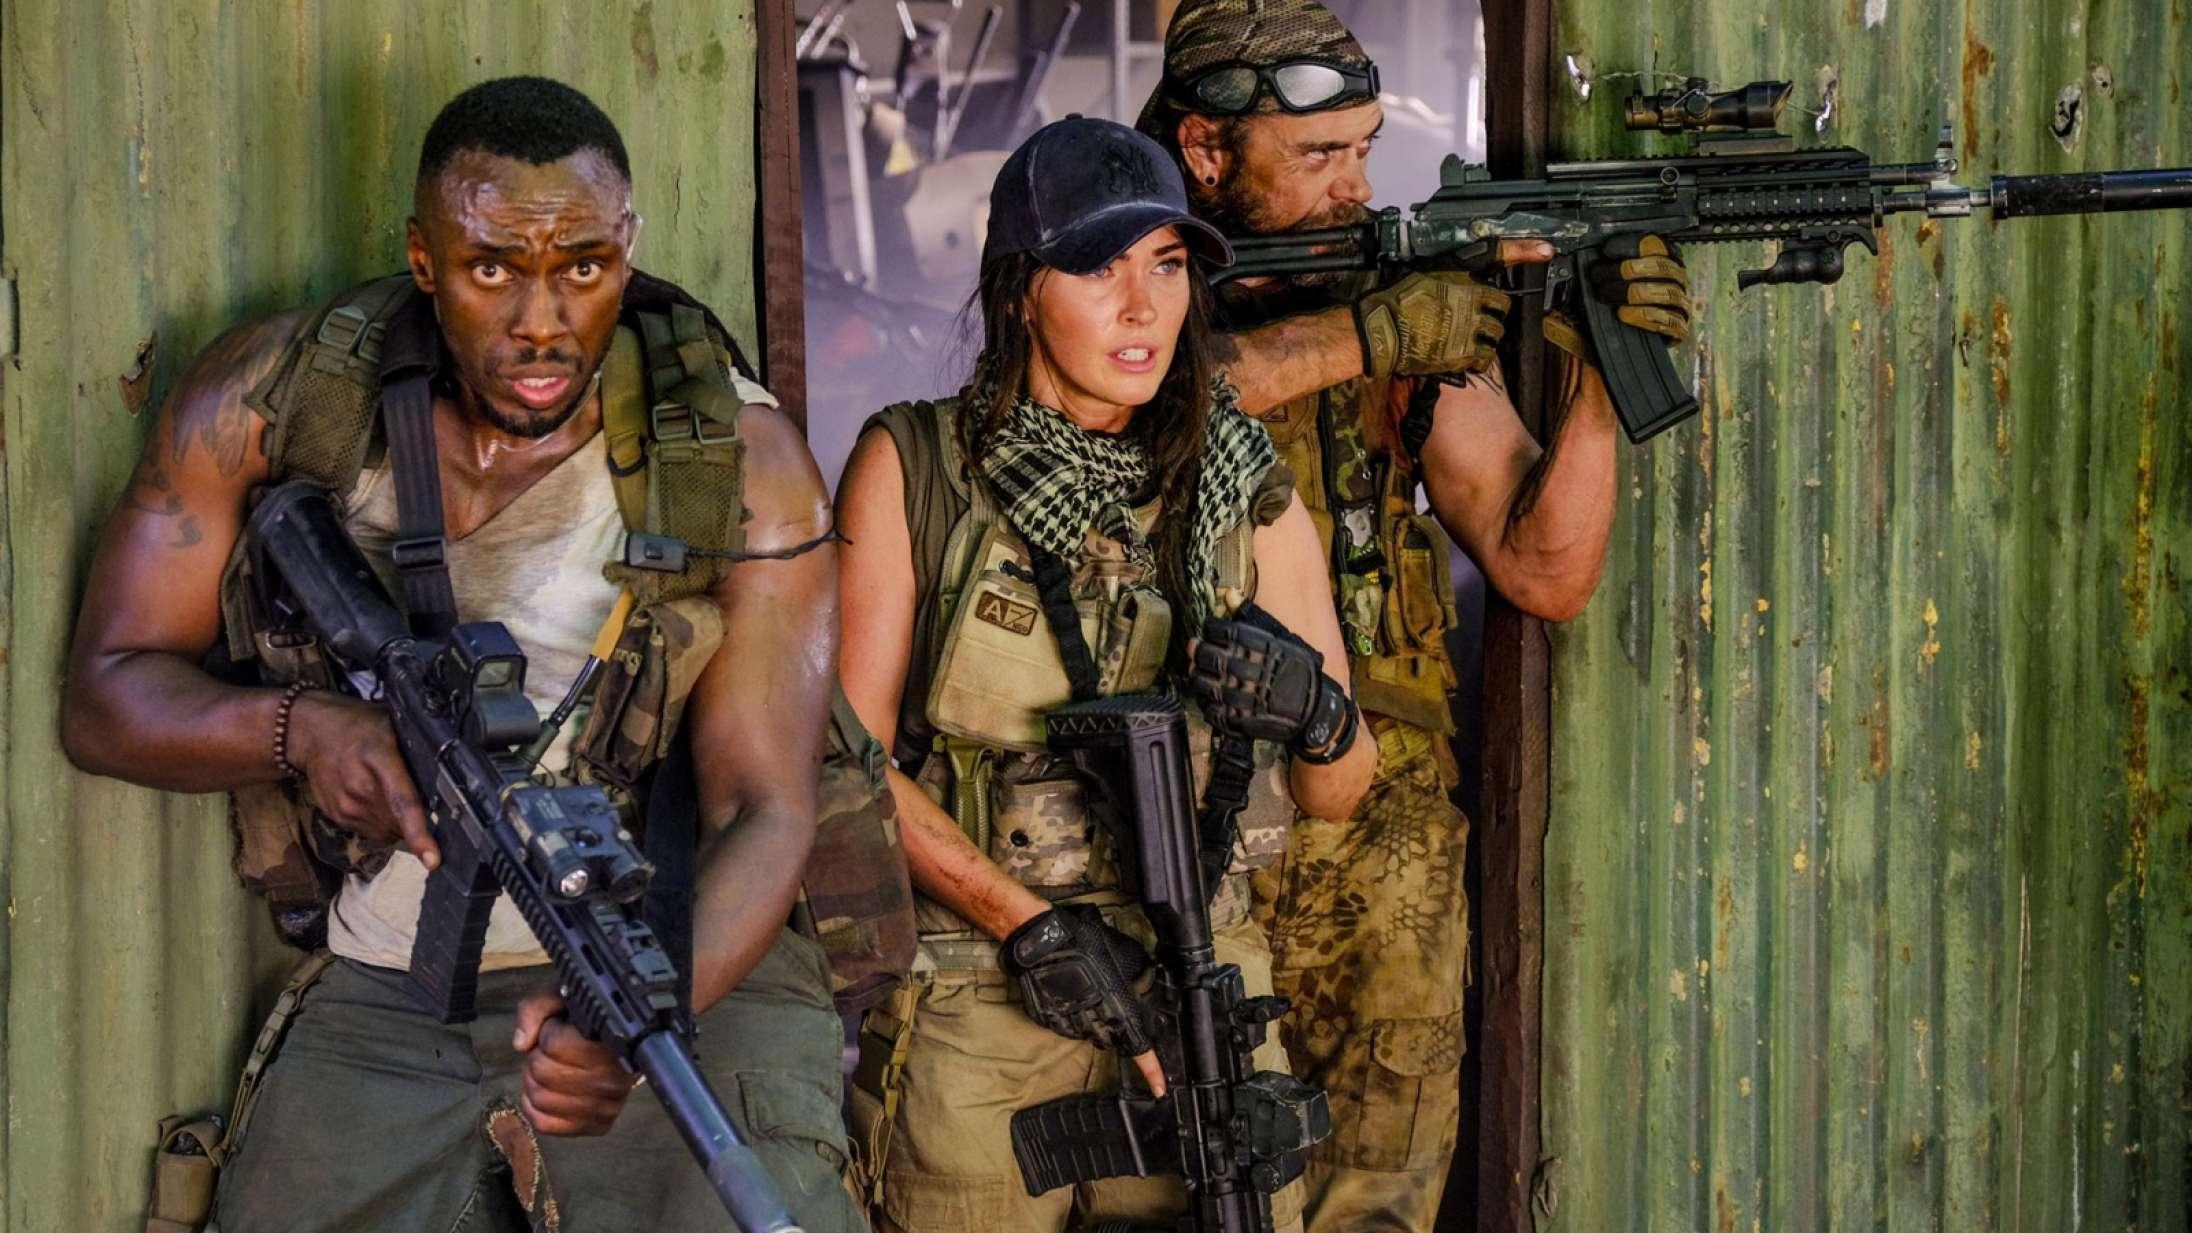 'Rogue': Løvemor jagter Megan Fox i bizar belejringsfilm